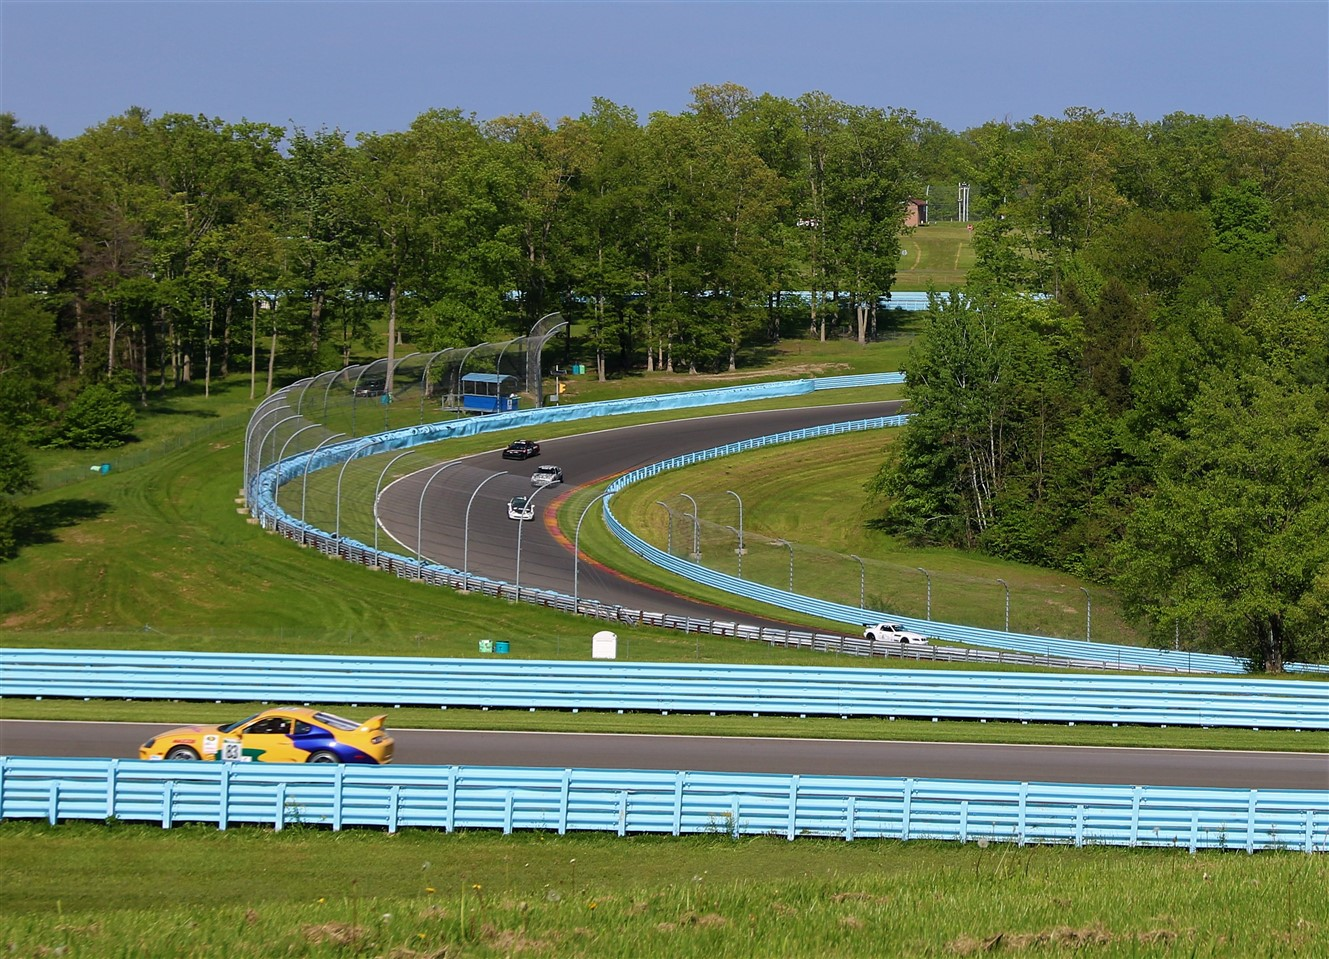 2018 05 25 272 Watkins Glen NY Racetrack